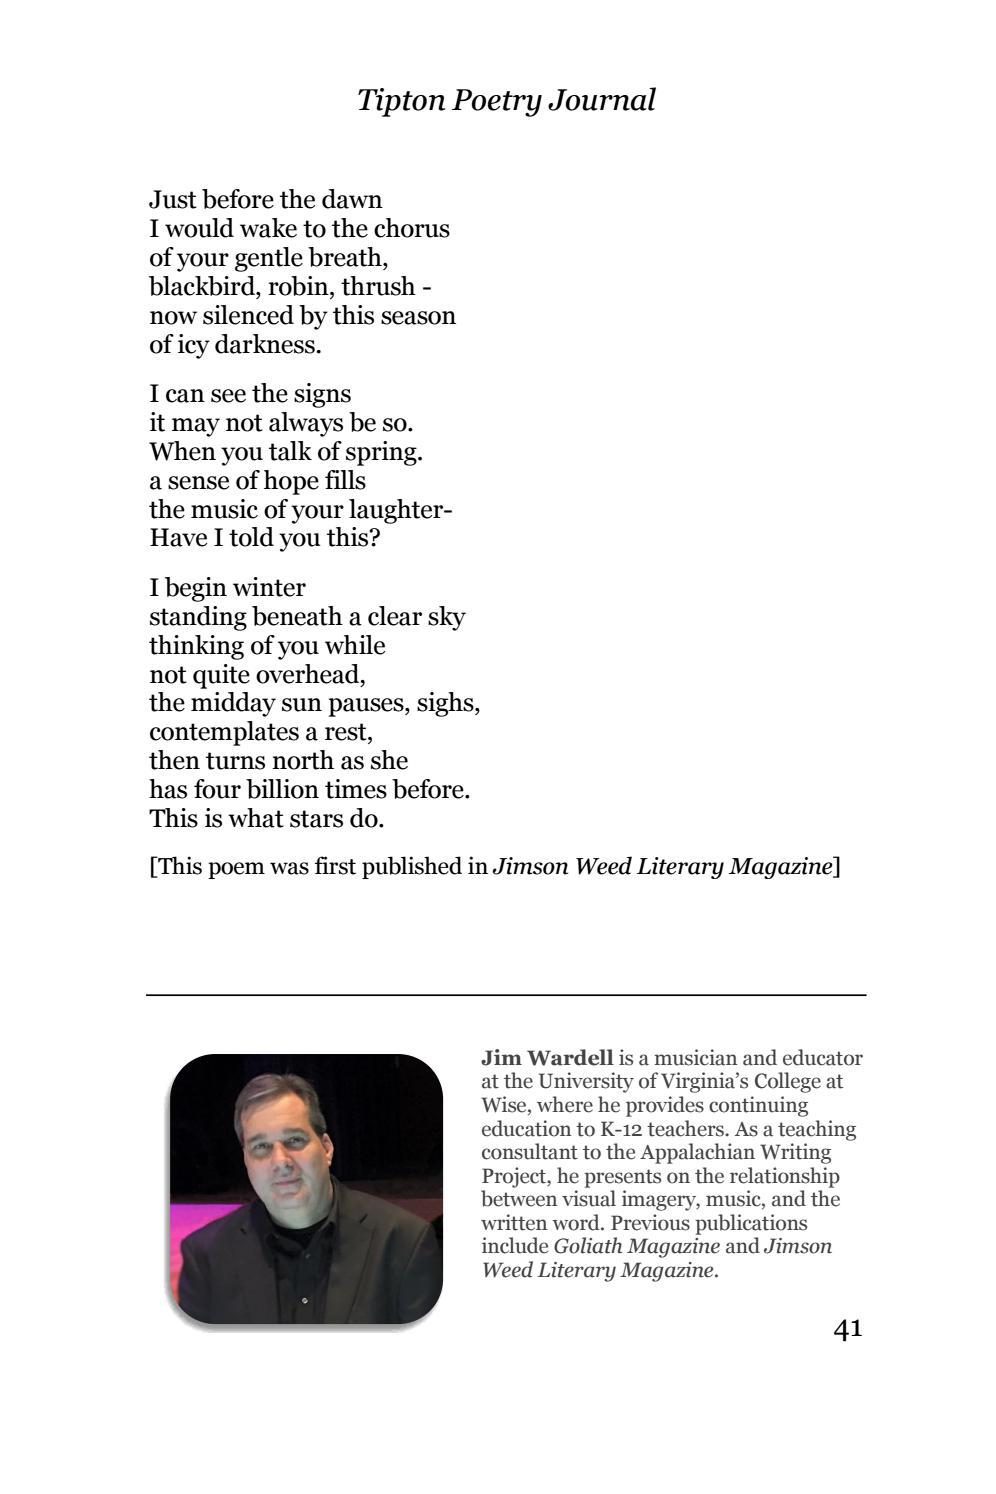 Tipton Poetry Journal #29 by Tipton Poetry Journal - issuu